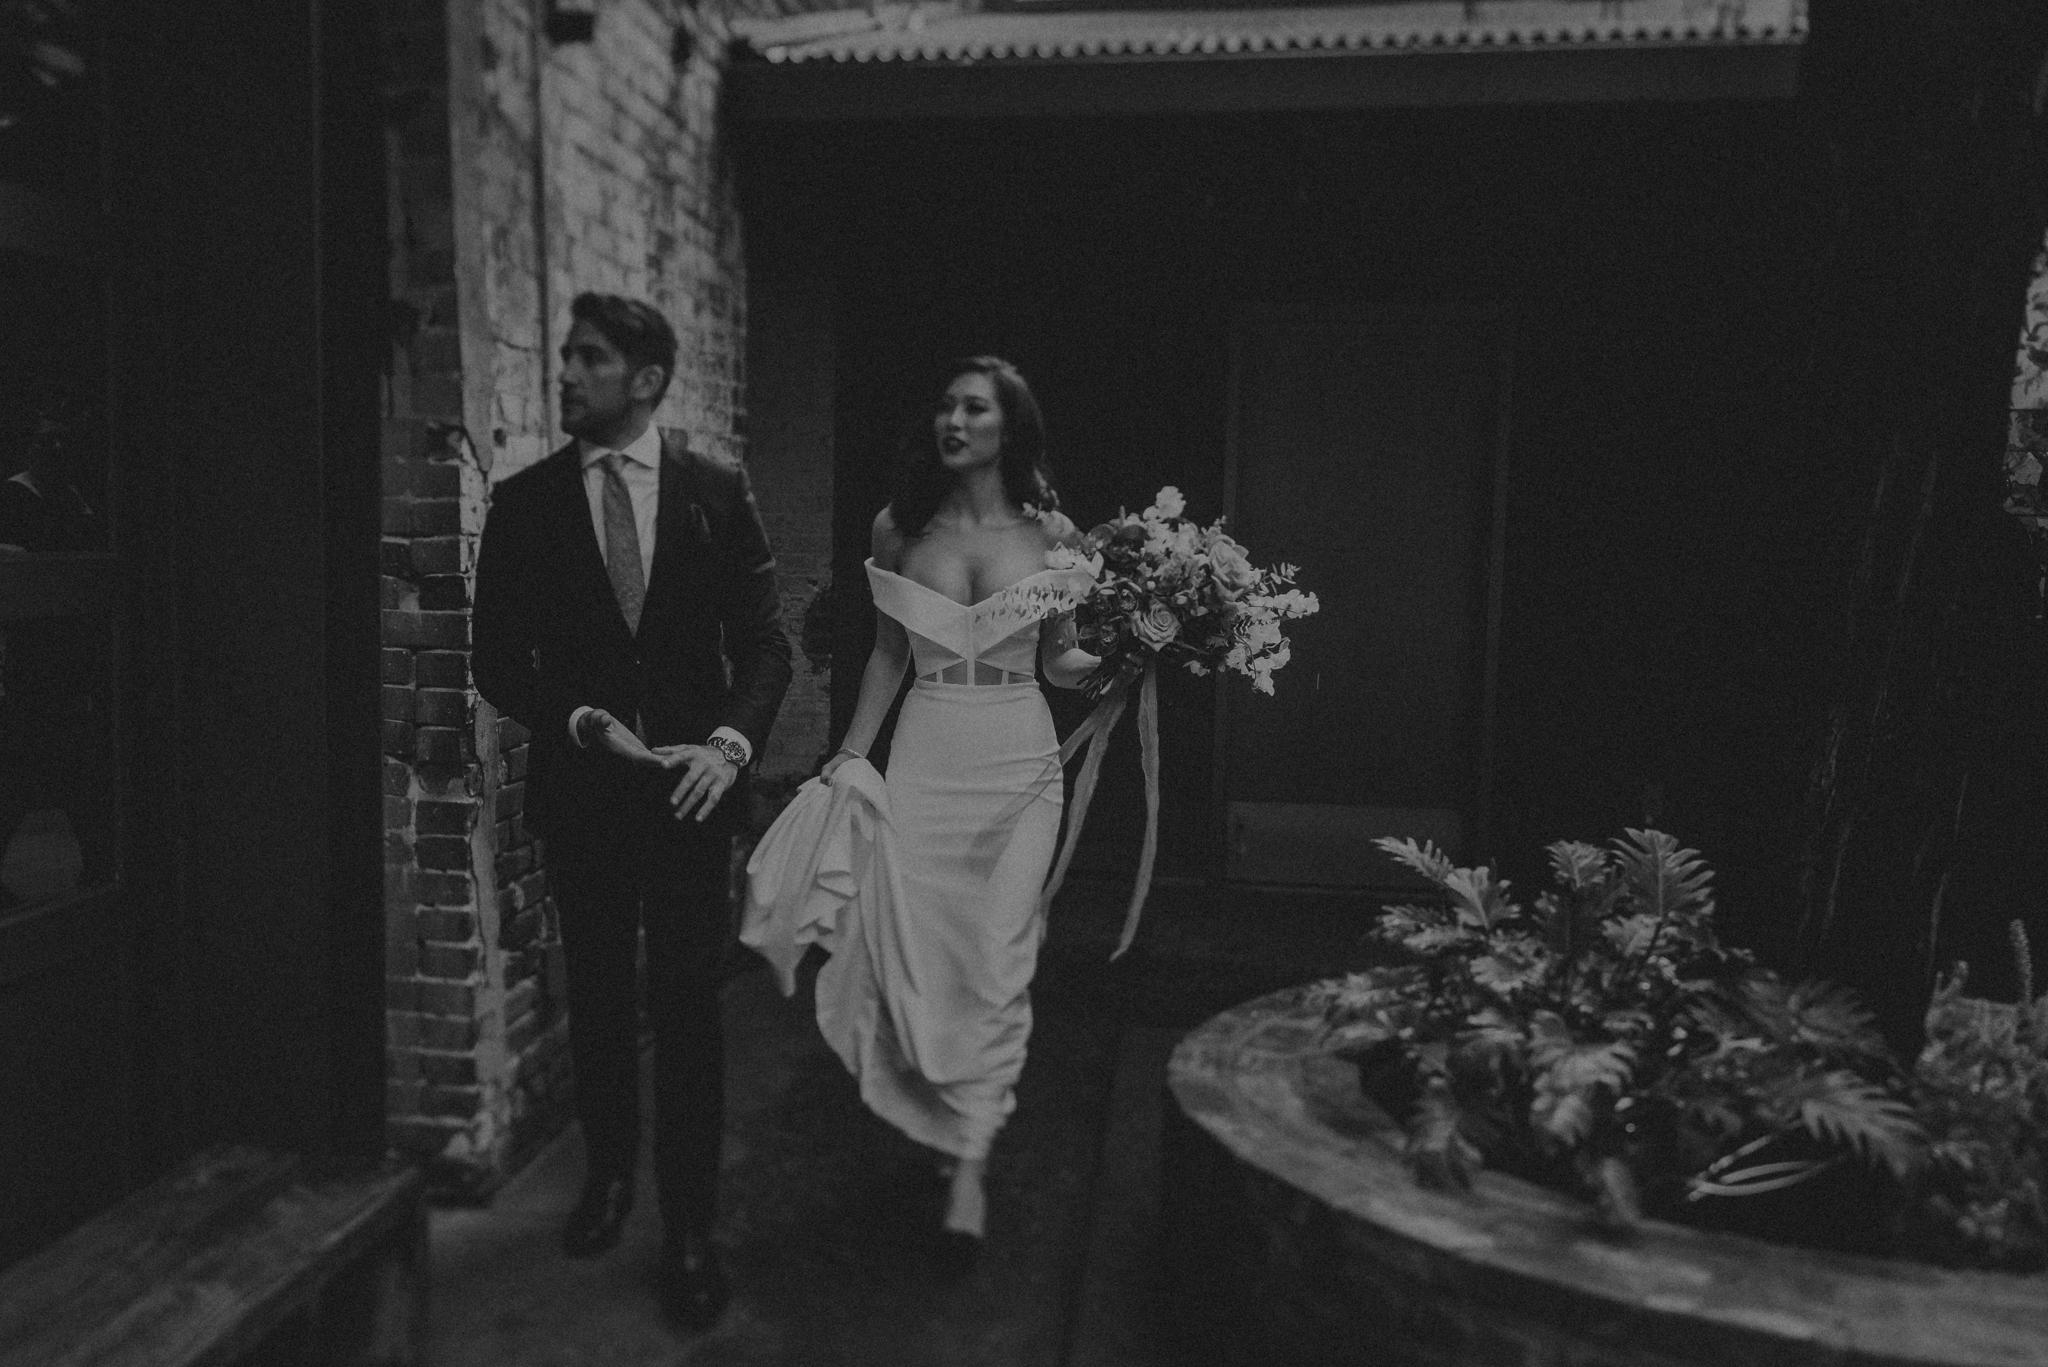 Wedding Photo LA - wedding photographer in los angeles - millwick wedding venue -isaiahandtaylor.com-043.jpg